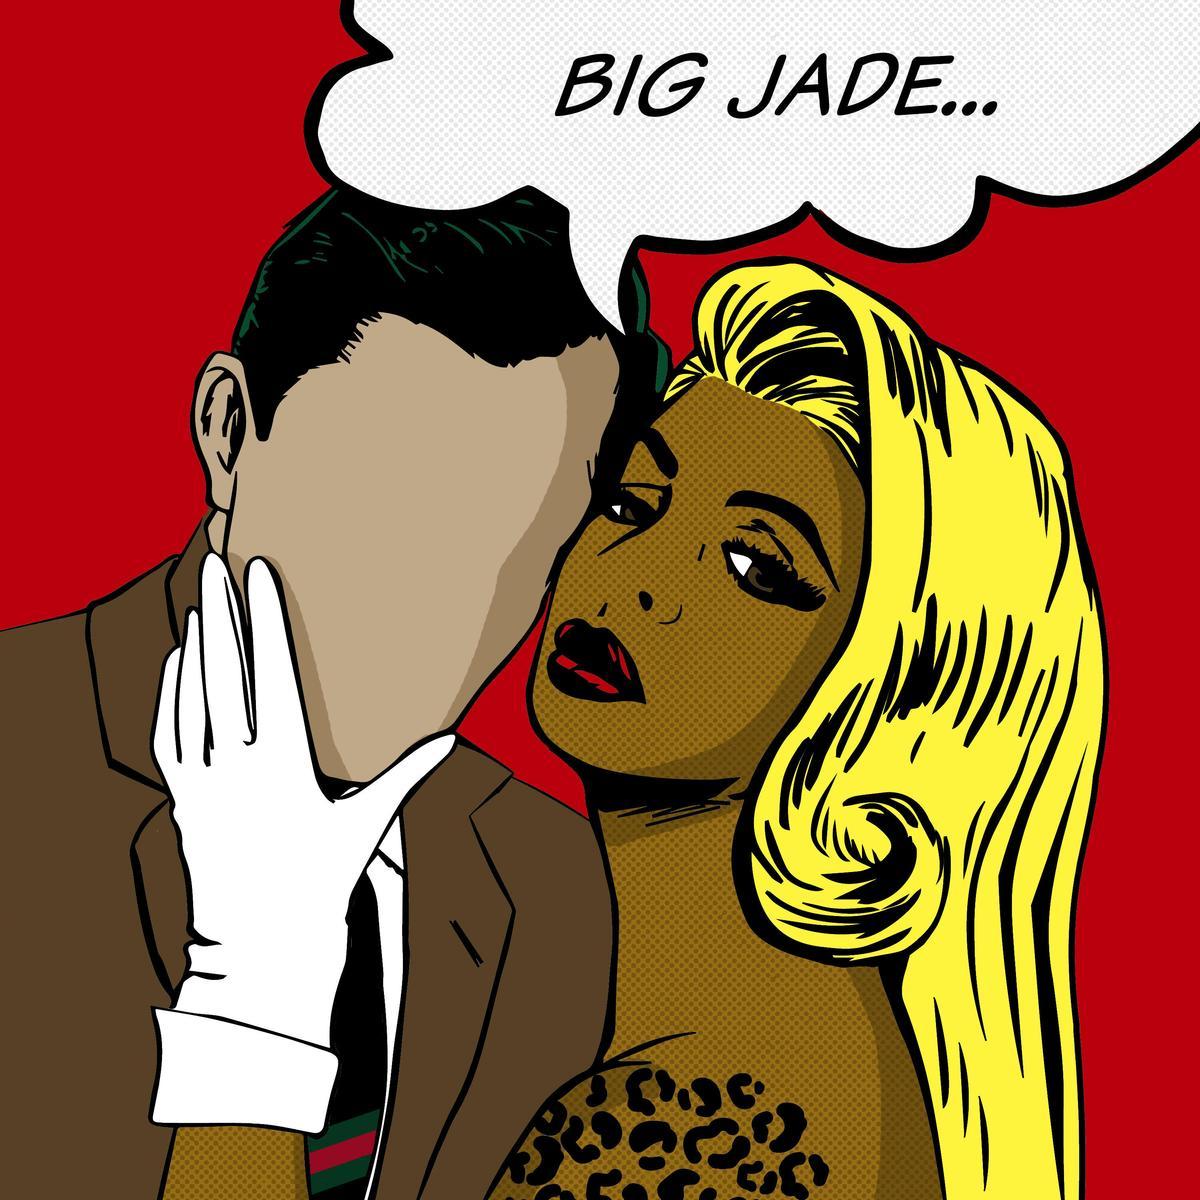 MP3: Big Jade - Gucci Bag Ft. DJ Chose